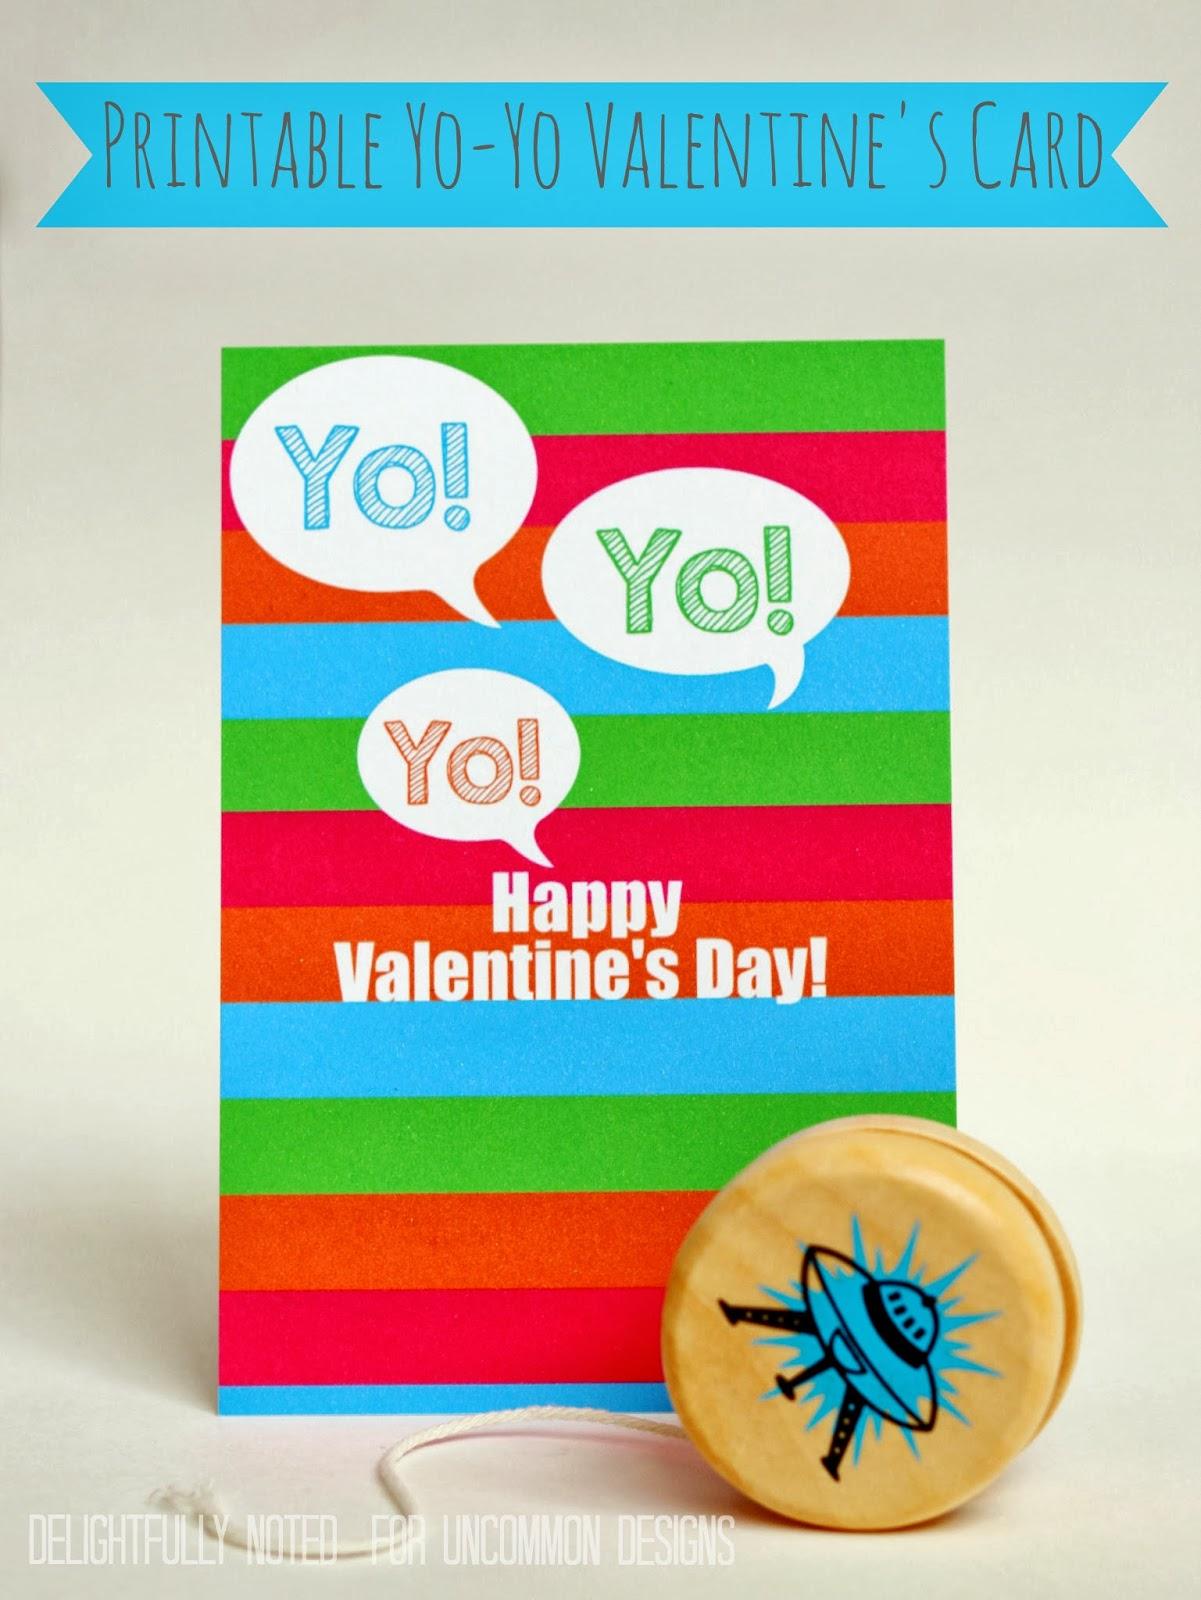 Free Printable Sorry Cards Writing Letter Of Resignation Sample Printable  Yo Yo Valentine Cards Free Printable  Free Printable Apology Cards